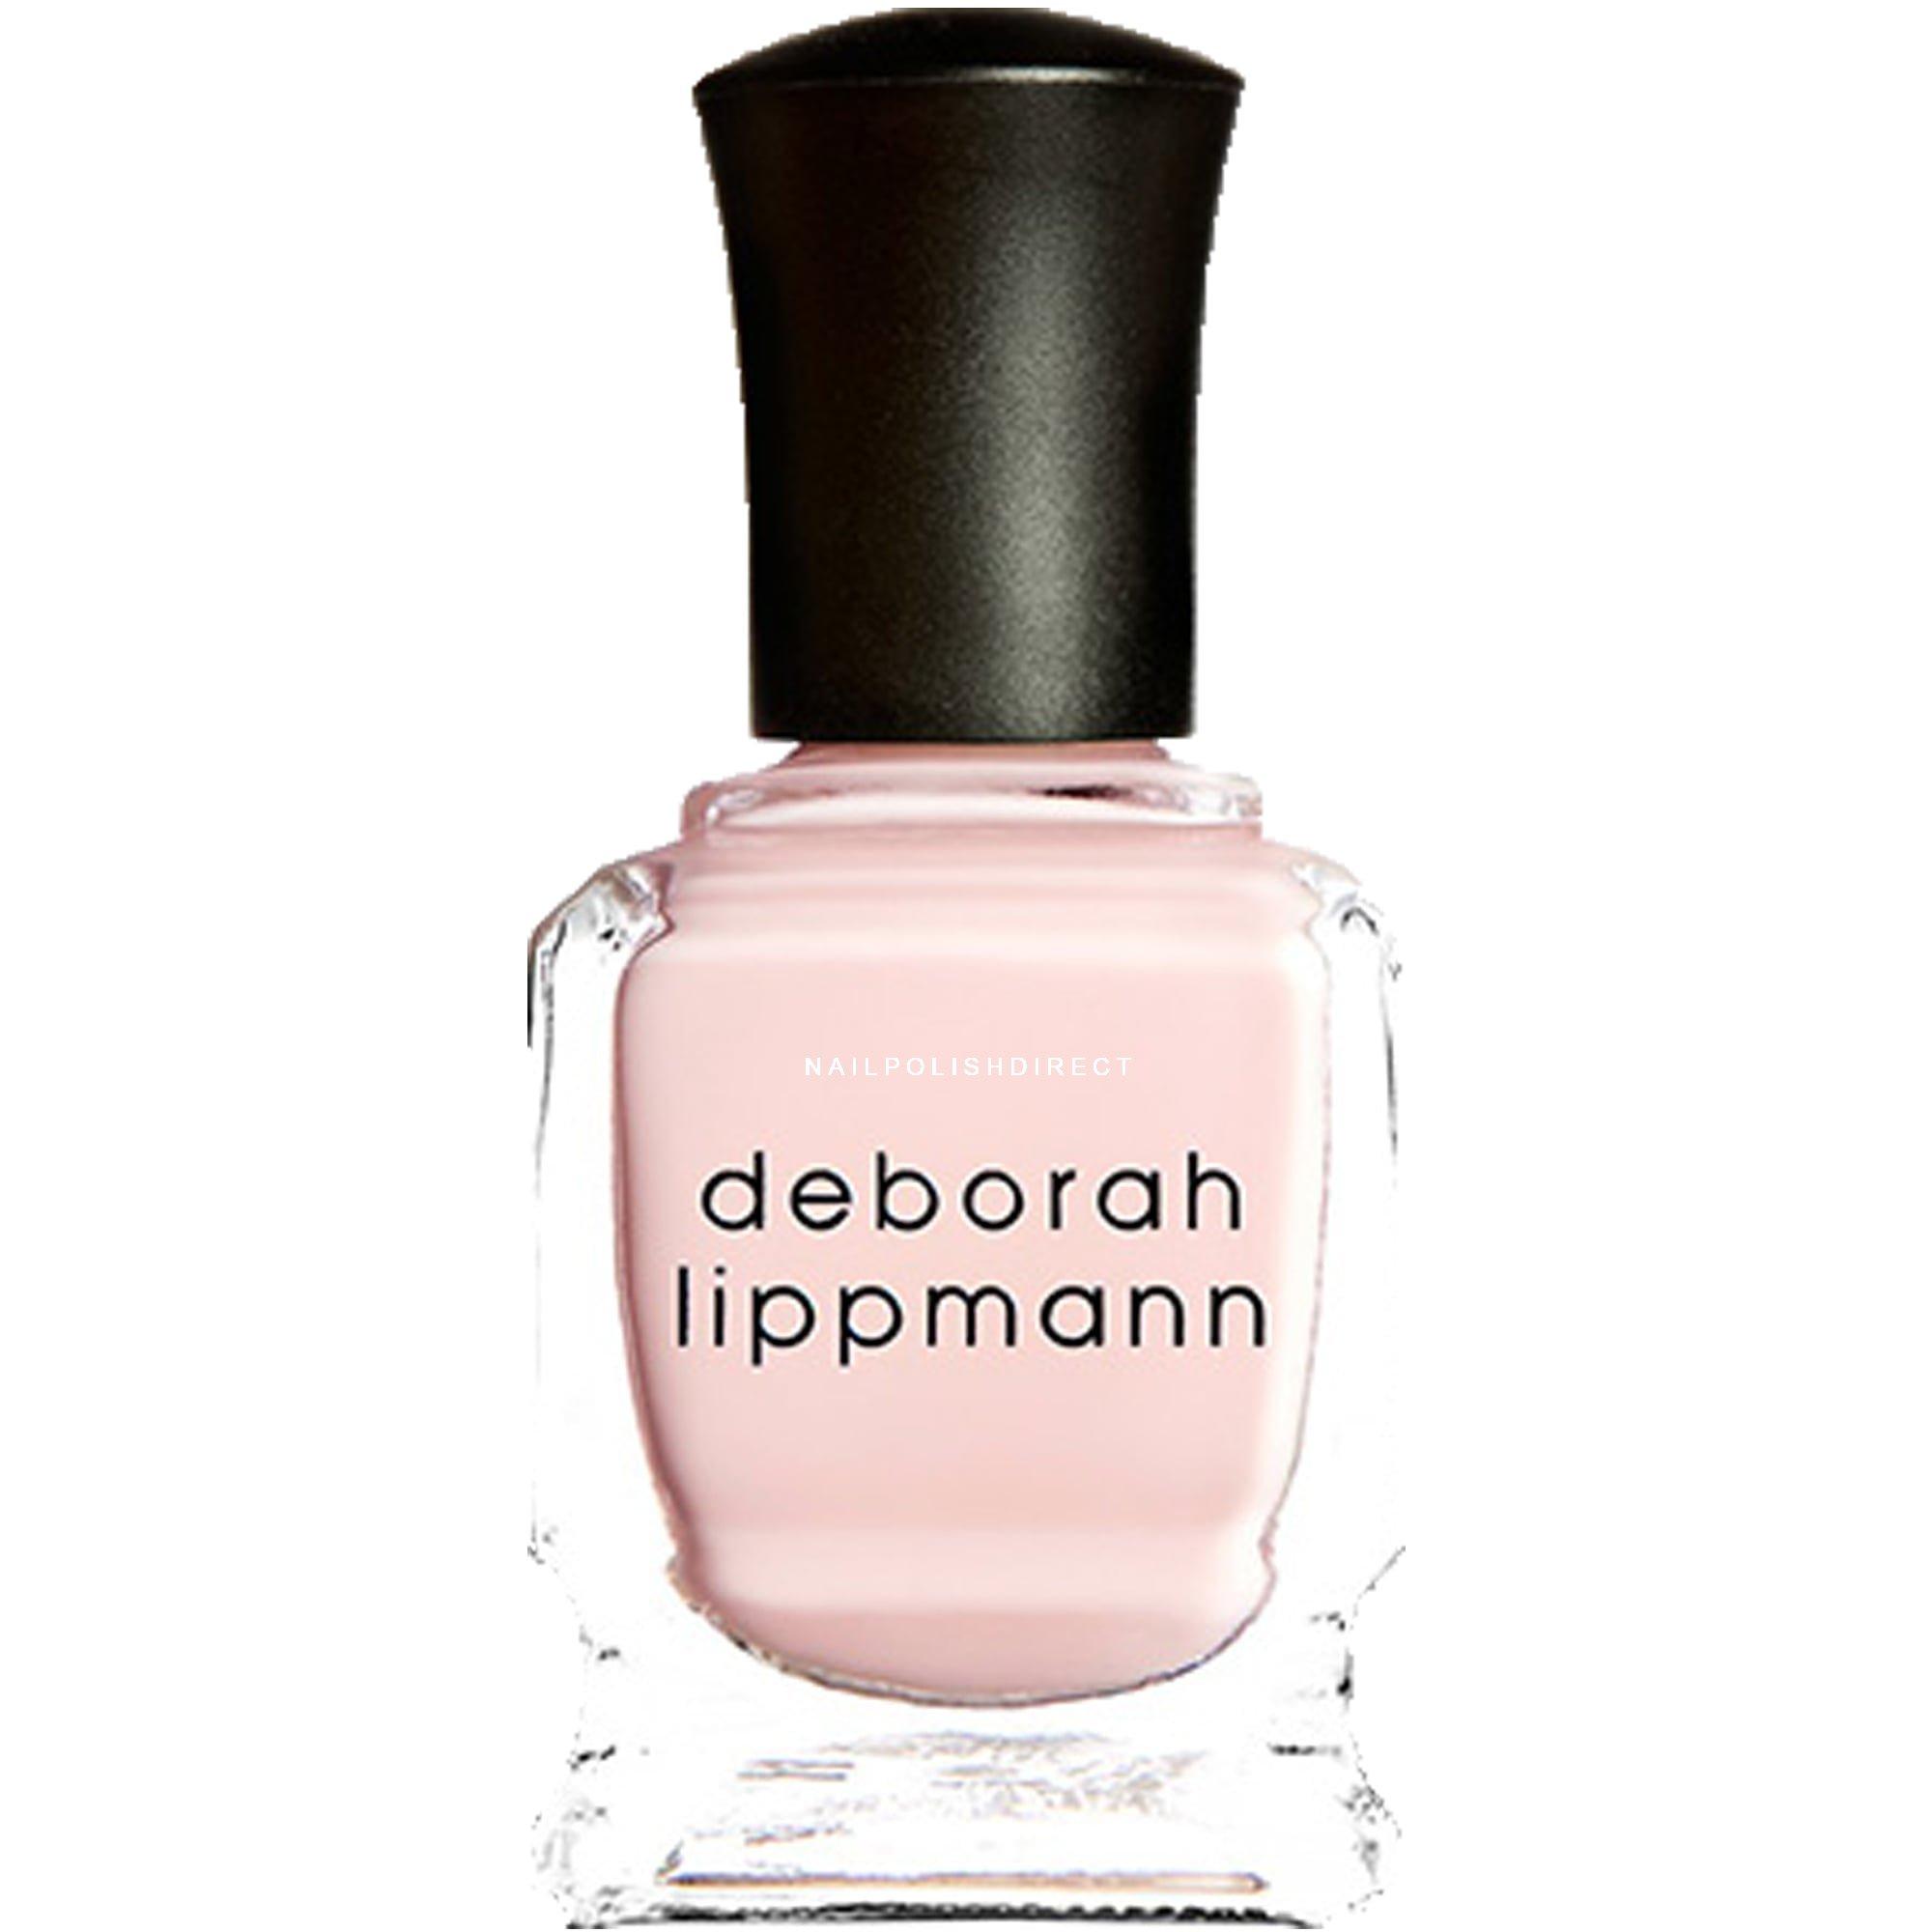 Deborah Lippmann Professional Nail Lacquer - Love Story 15ml (20399)